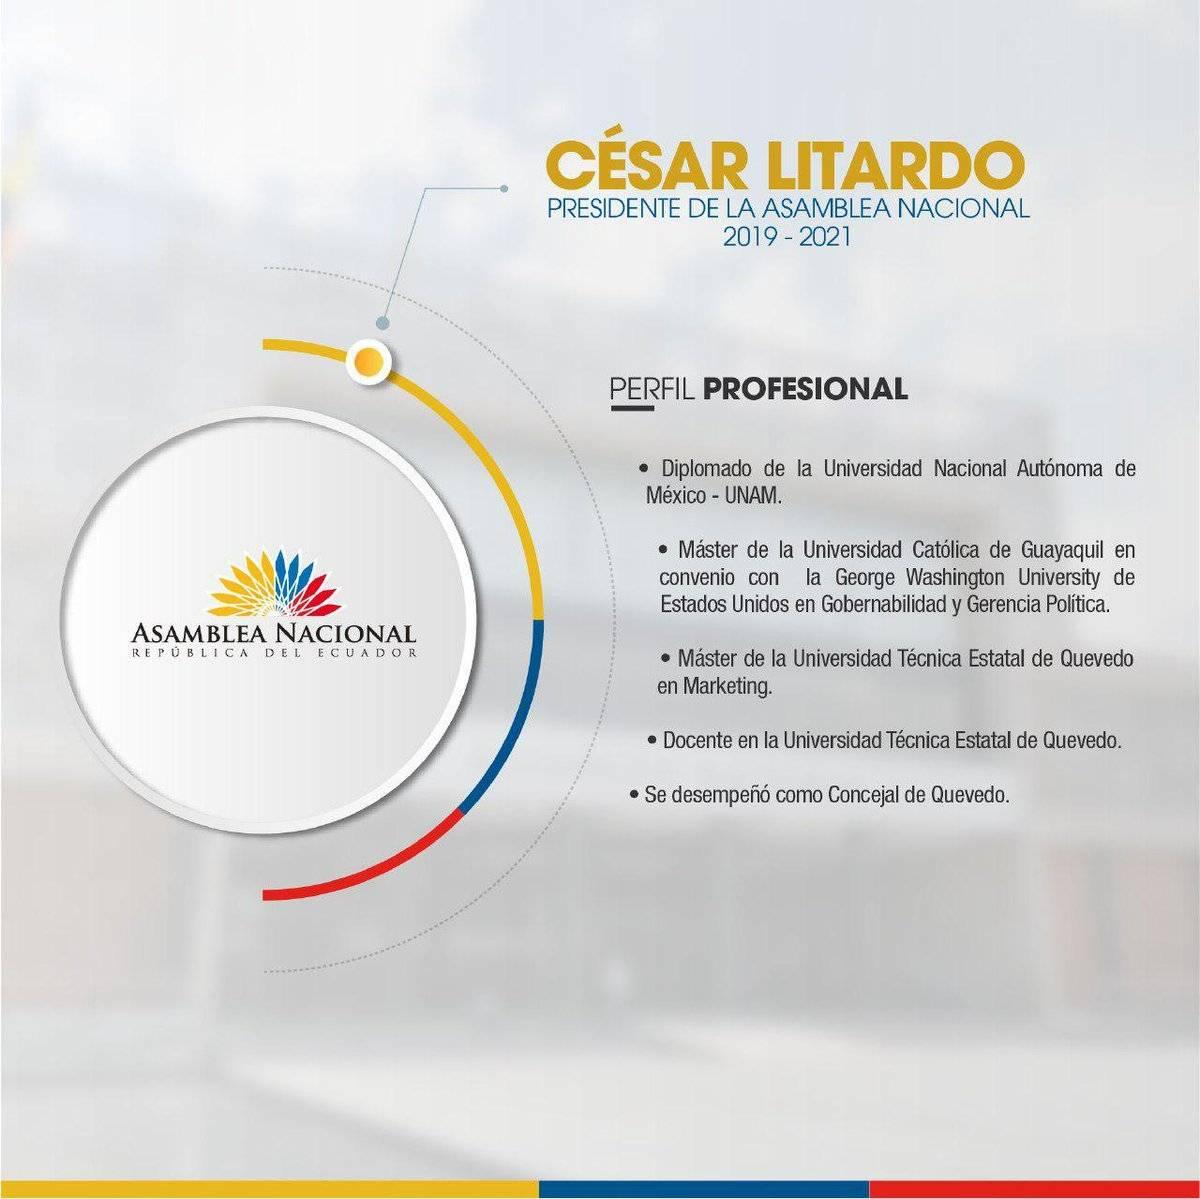 Cesar Litardo perfil profesional